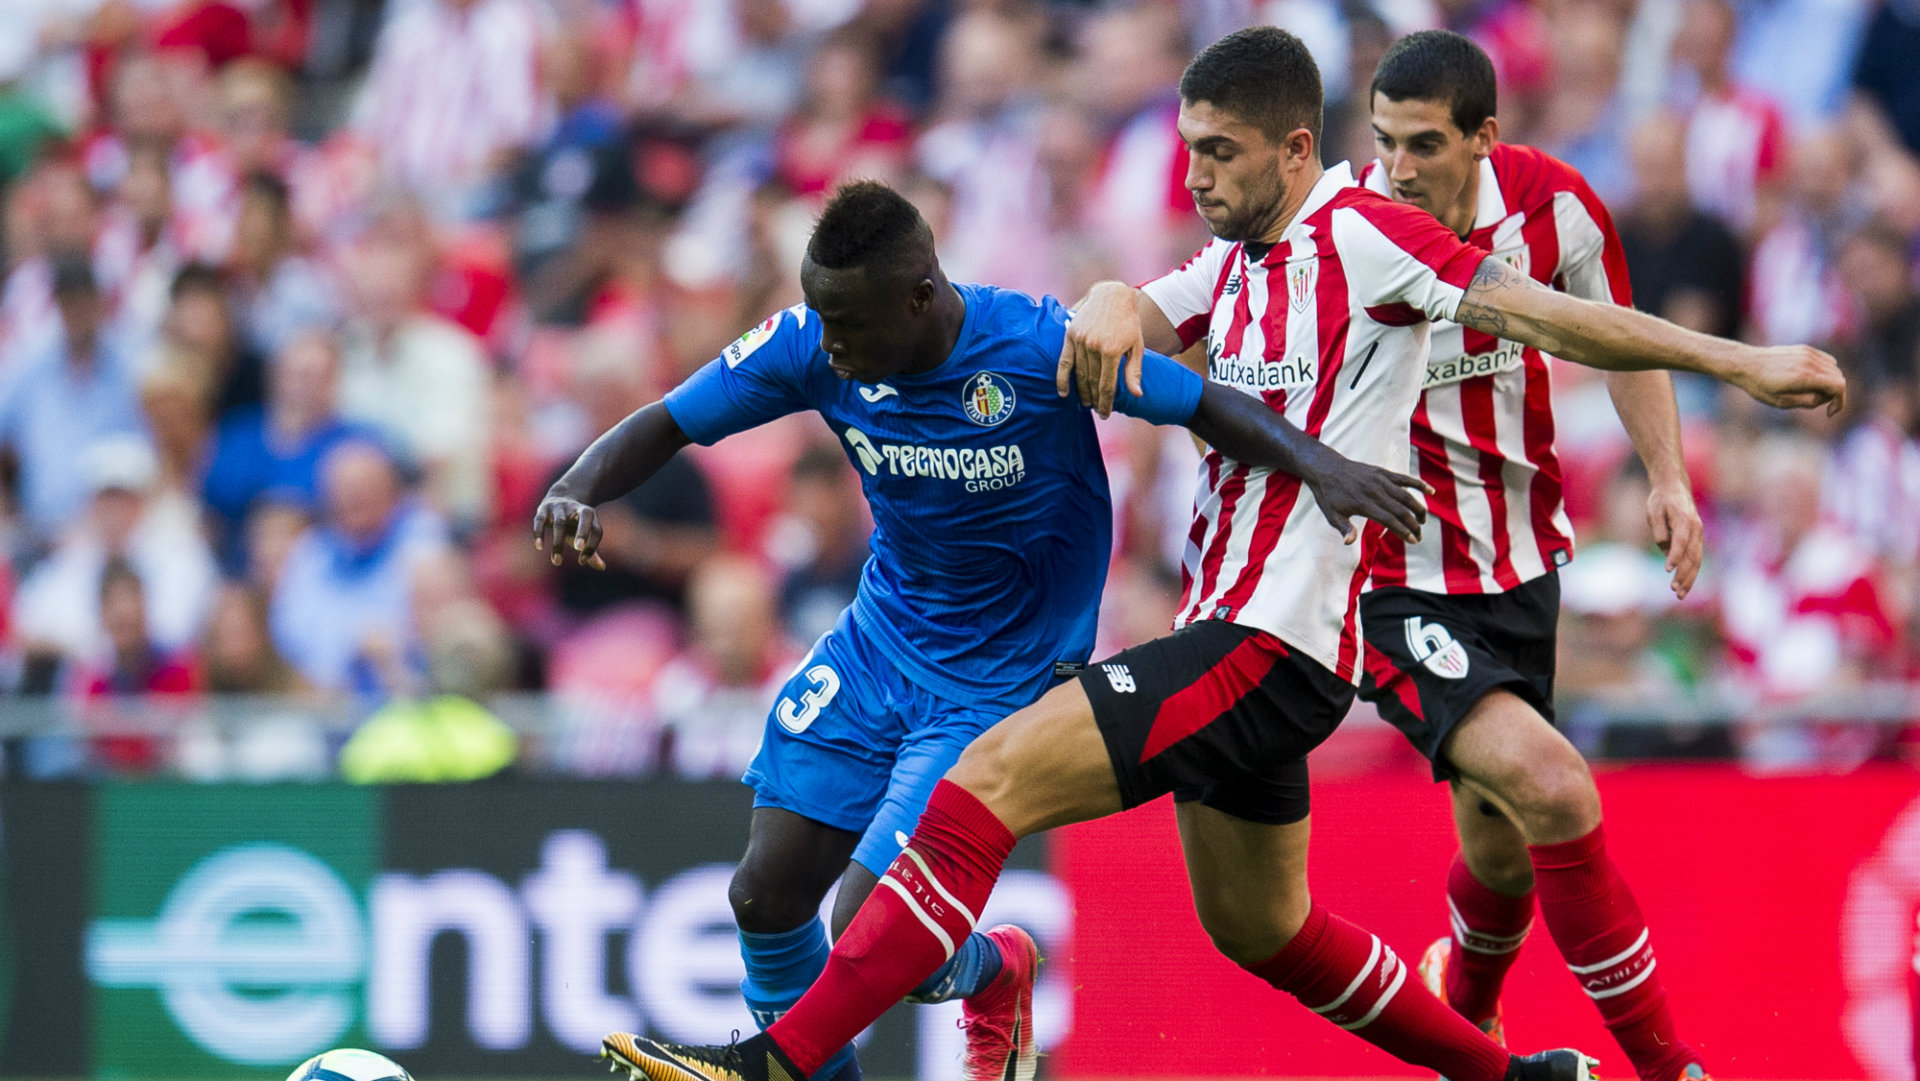 Unai Nunez, Athletic Bilbao 2017/18